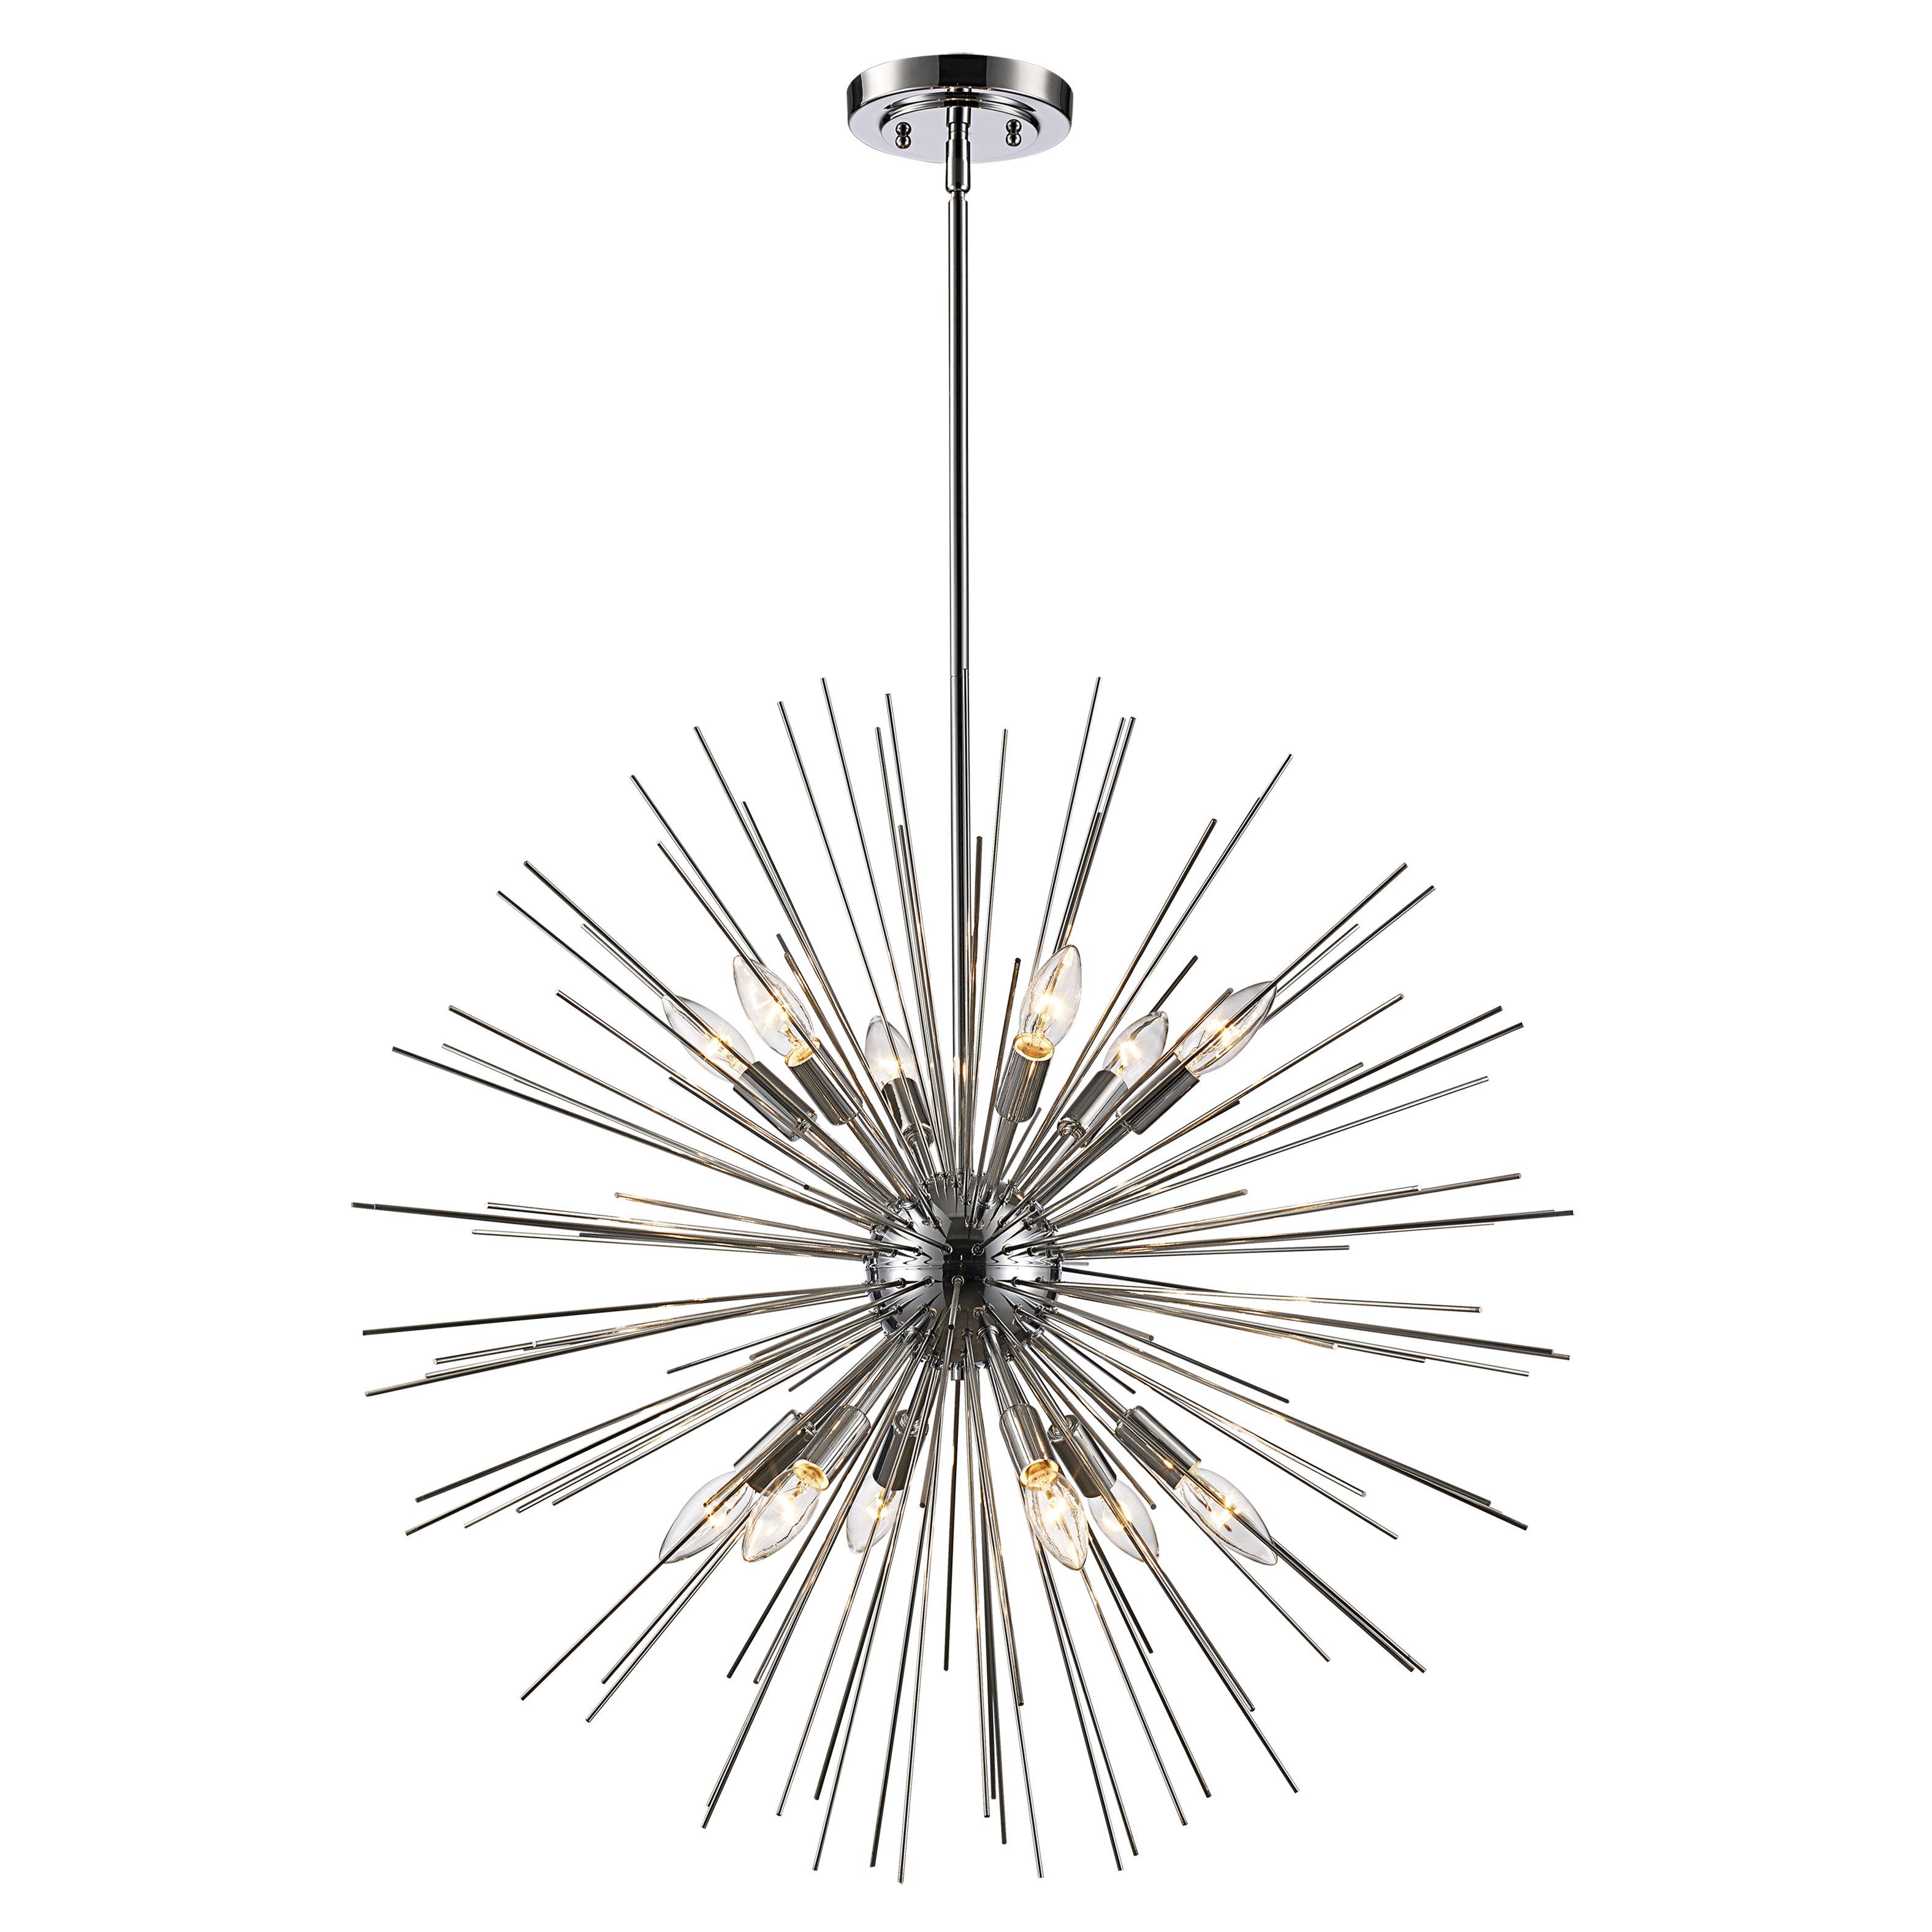 Antonie 12 Light Sputnik Chandelier In Widely Used Corona 12 Light Sputnik Chandeliers (Gallery 12 of 20)